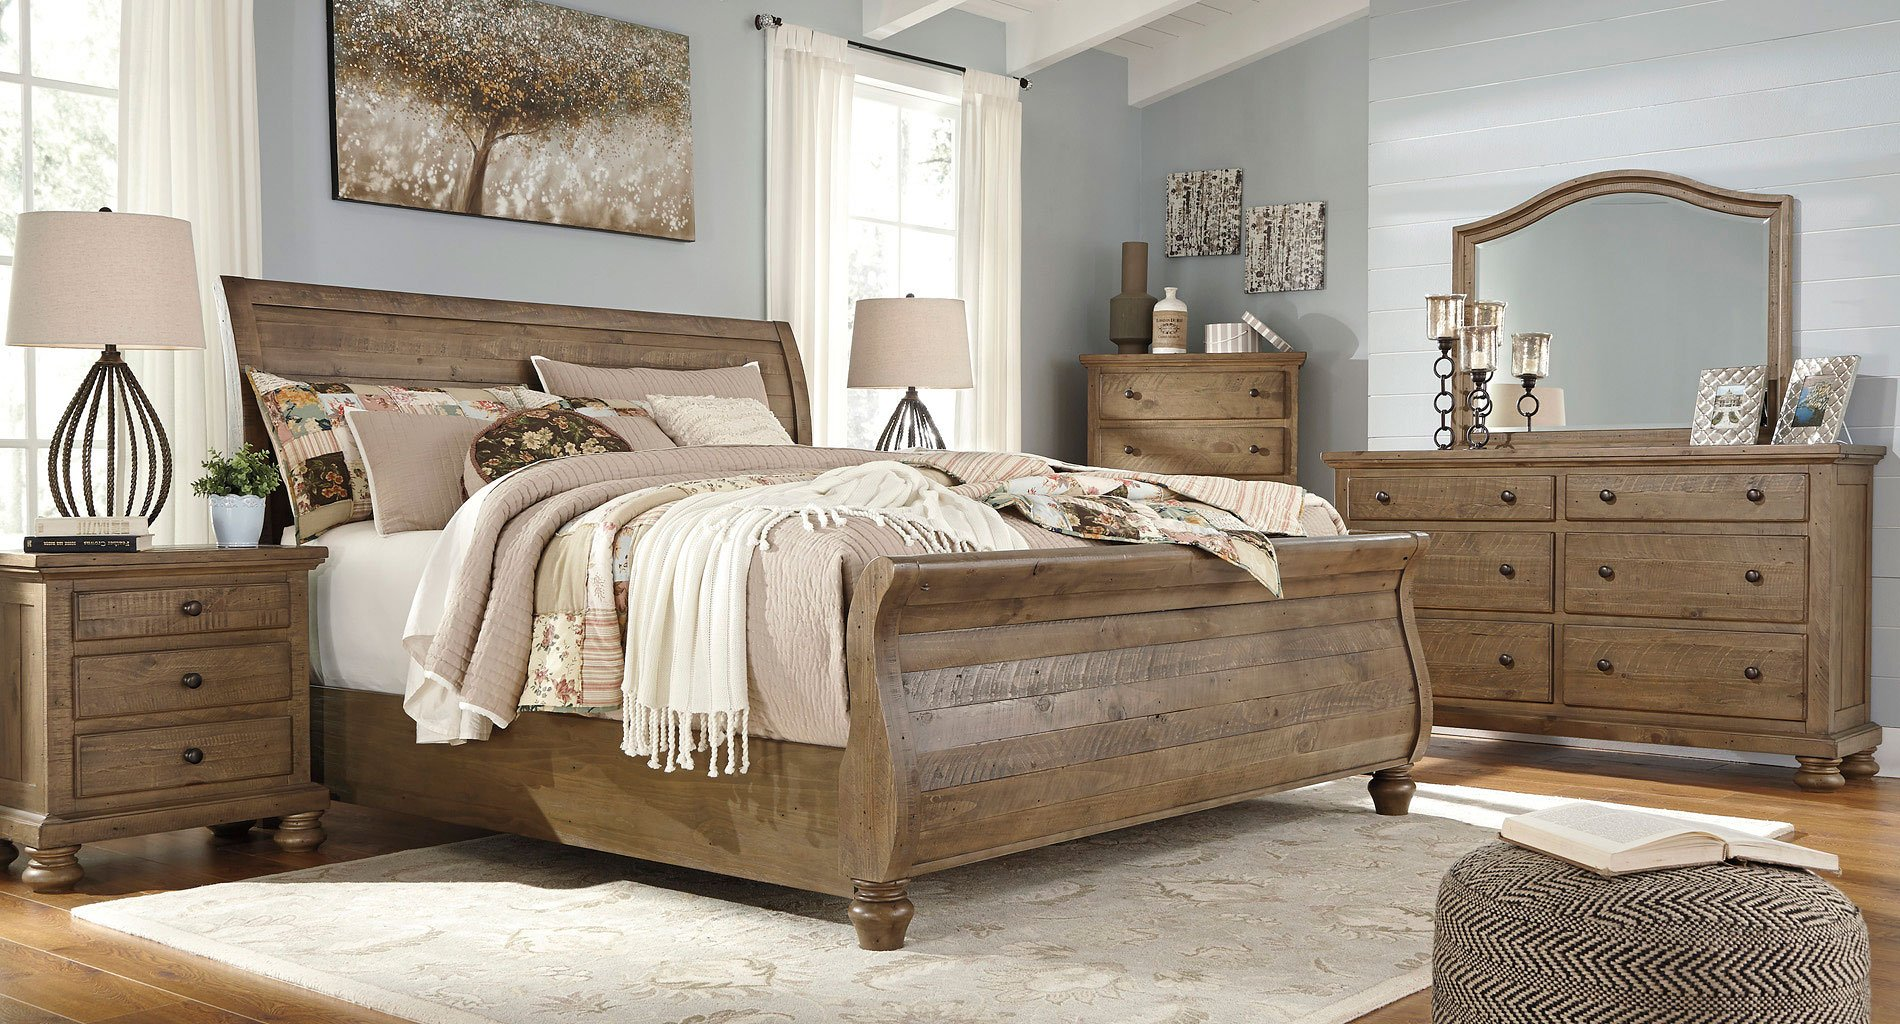 Beau Trishley Sleigh Bedroom Set